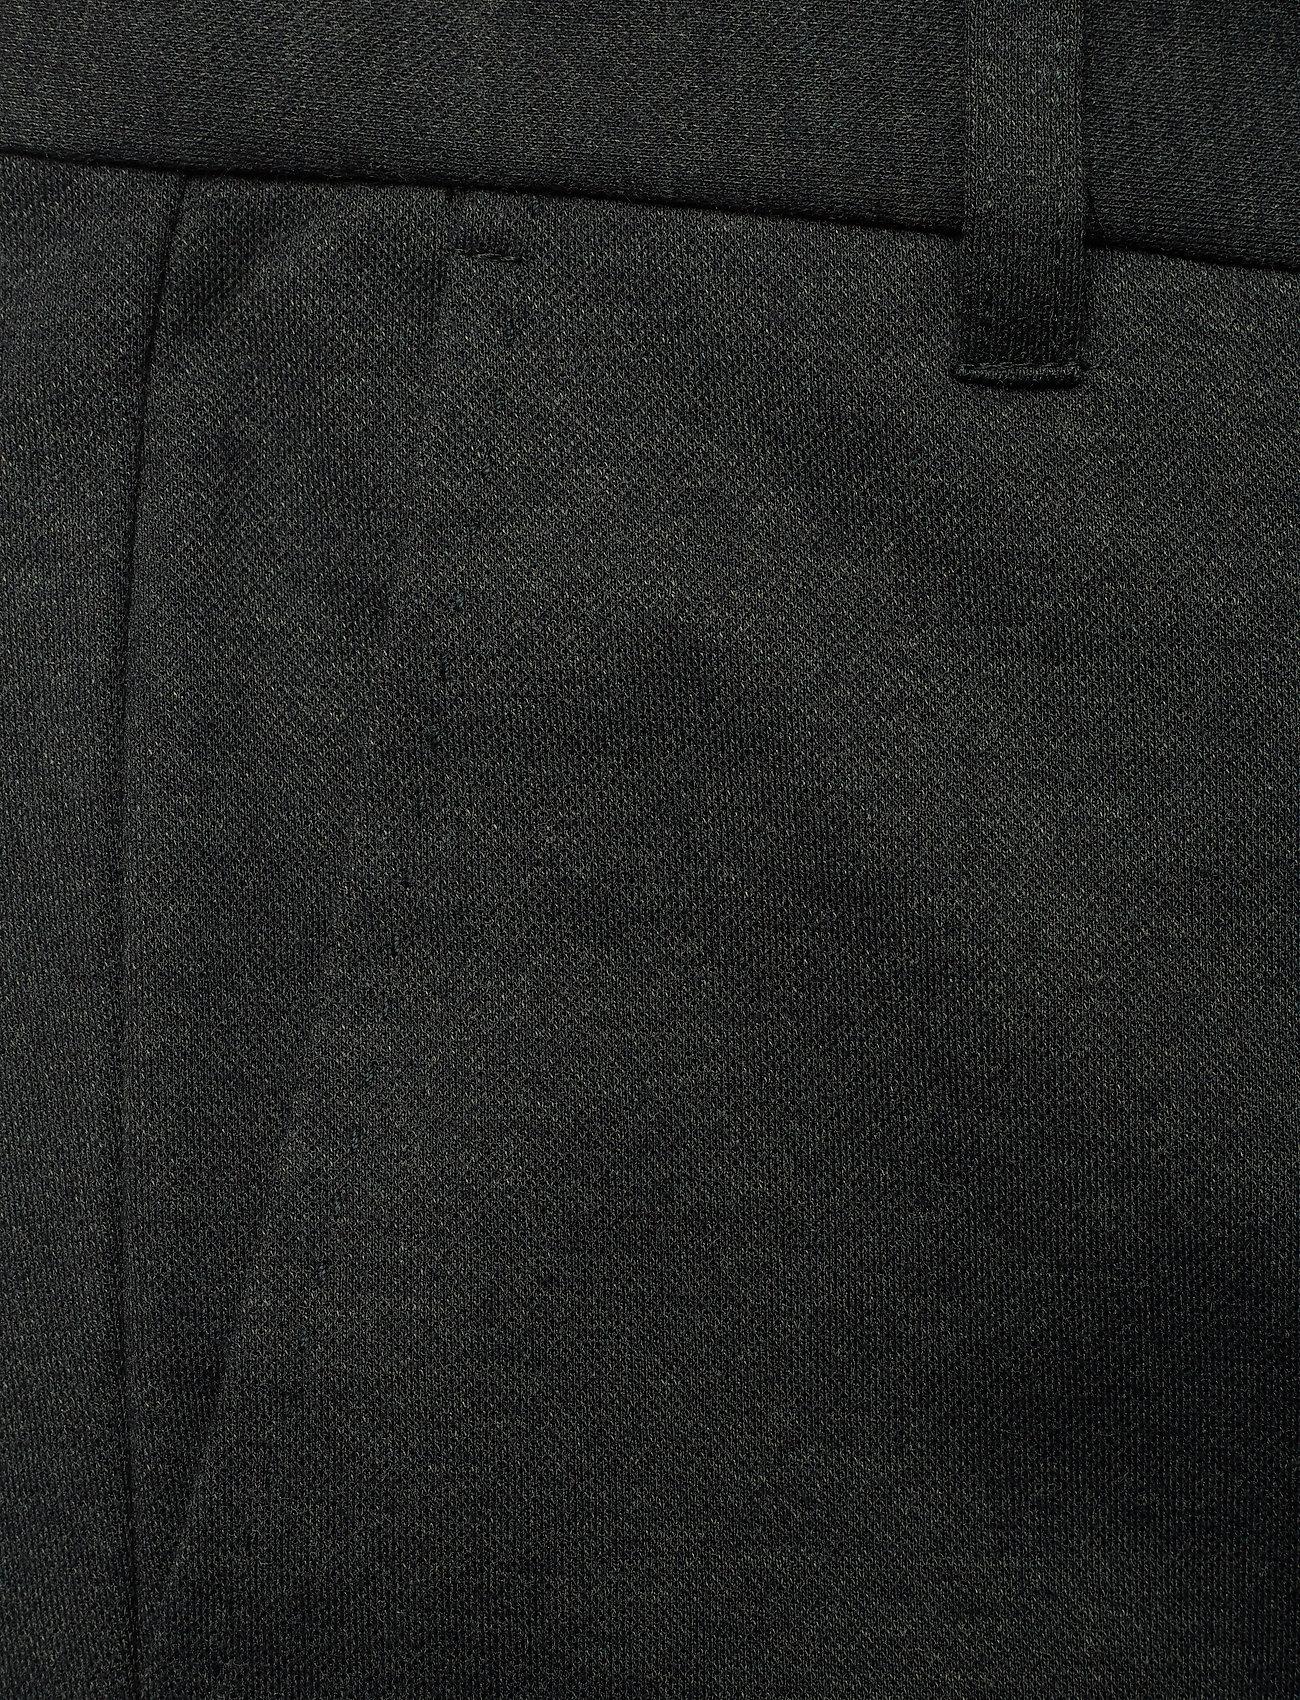 Knitted Knitted Pantsarmy MixLindbergh MixLindbergh Pantsarmy Knitted Cropped Cropped Cropped Pantsarmy MixLindbergh Knitted gf76yYbv